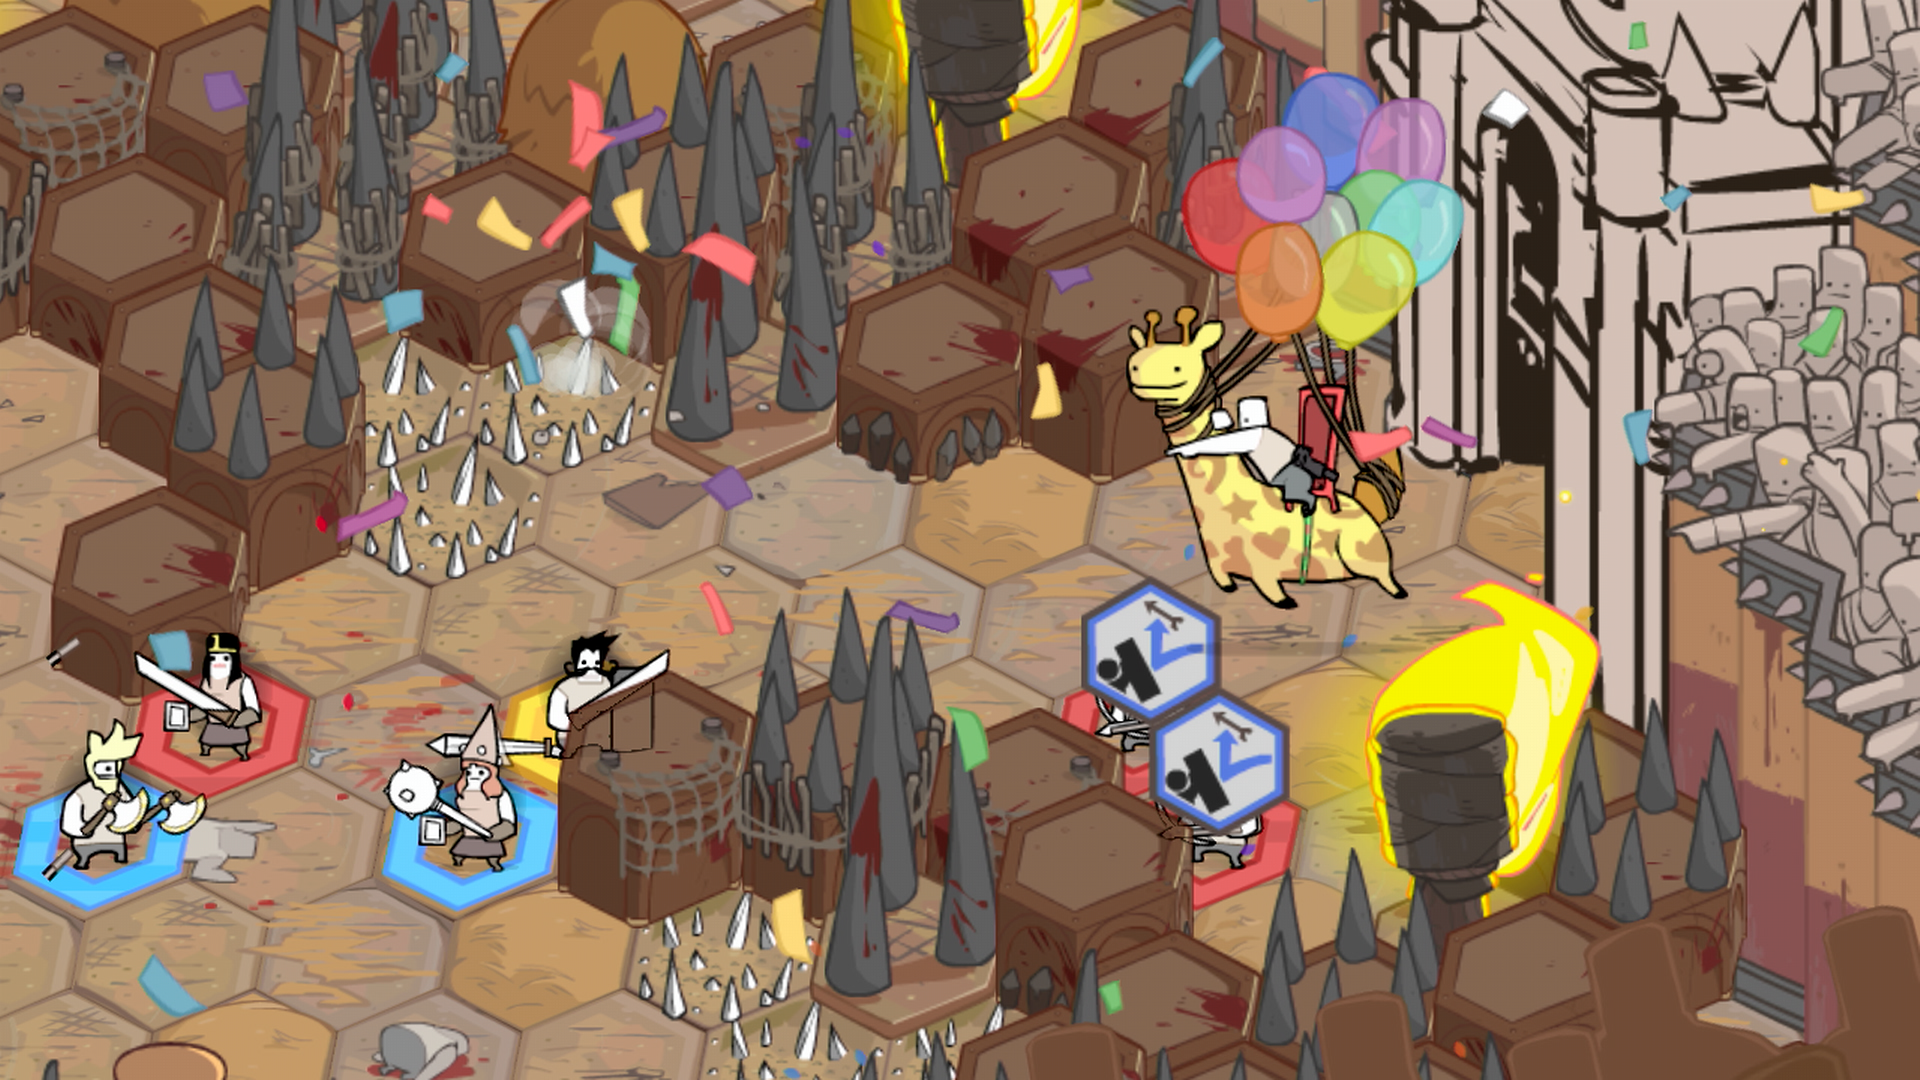 Game4_ArenaGameplayUziGiraffe